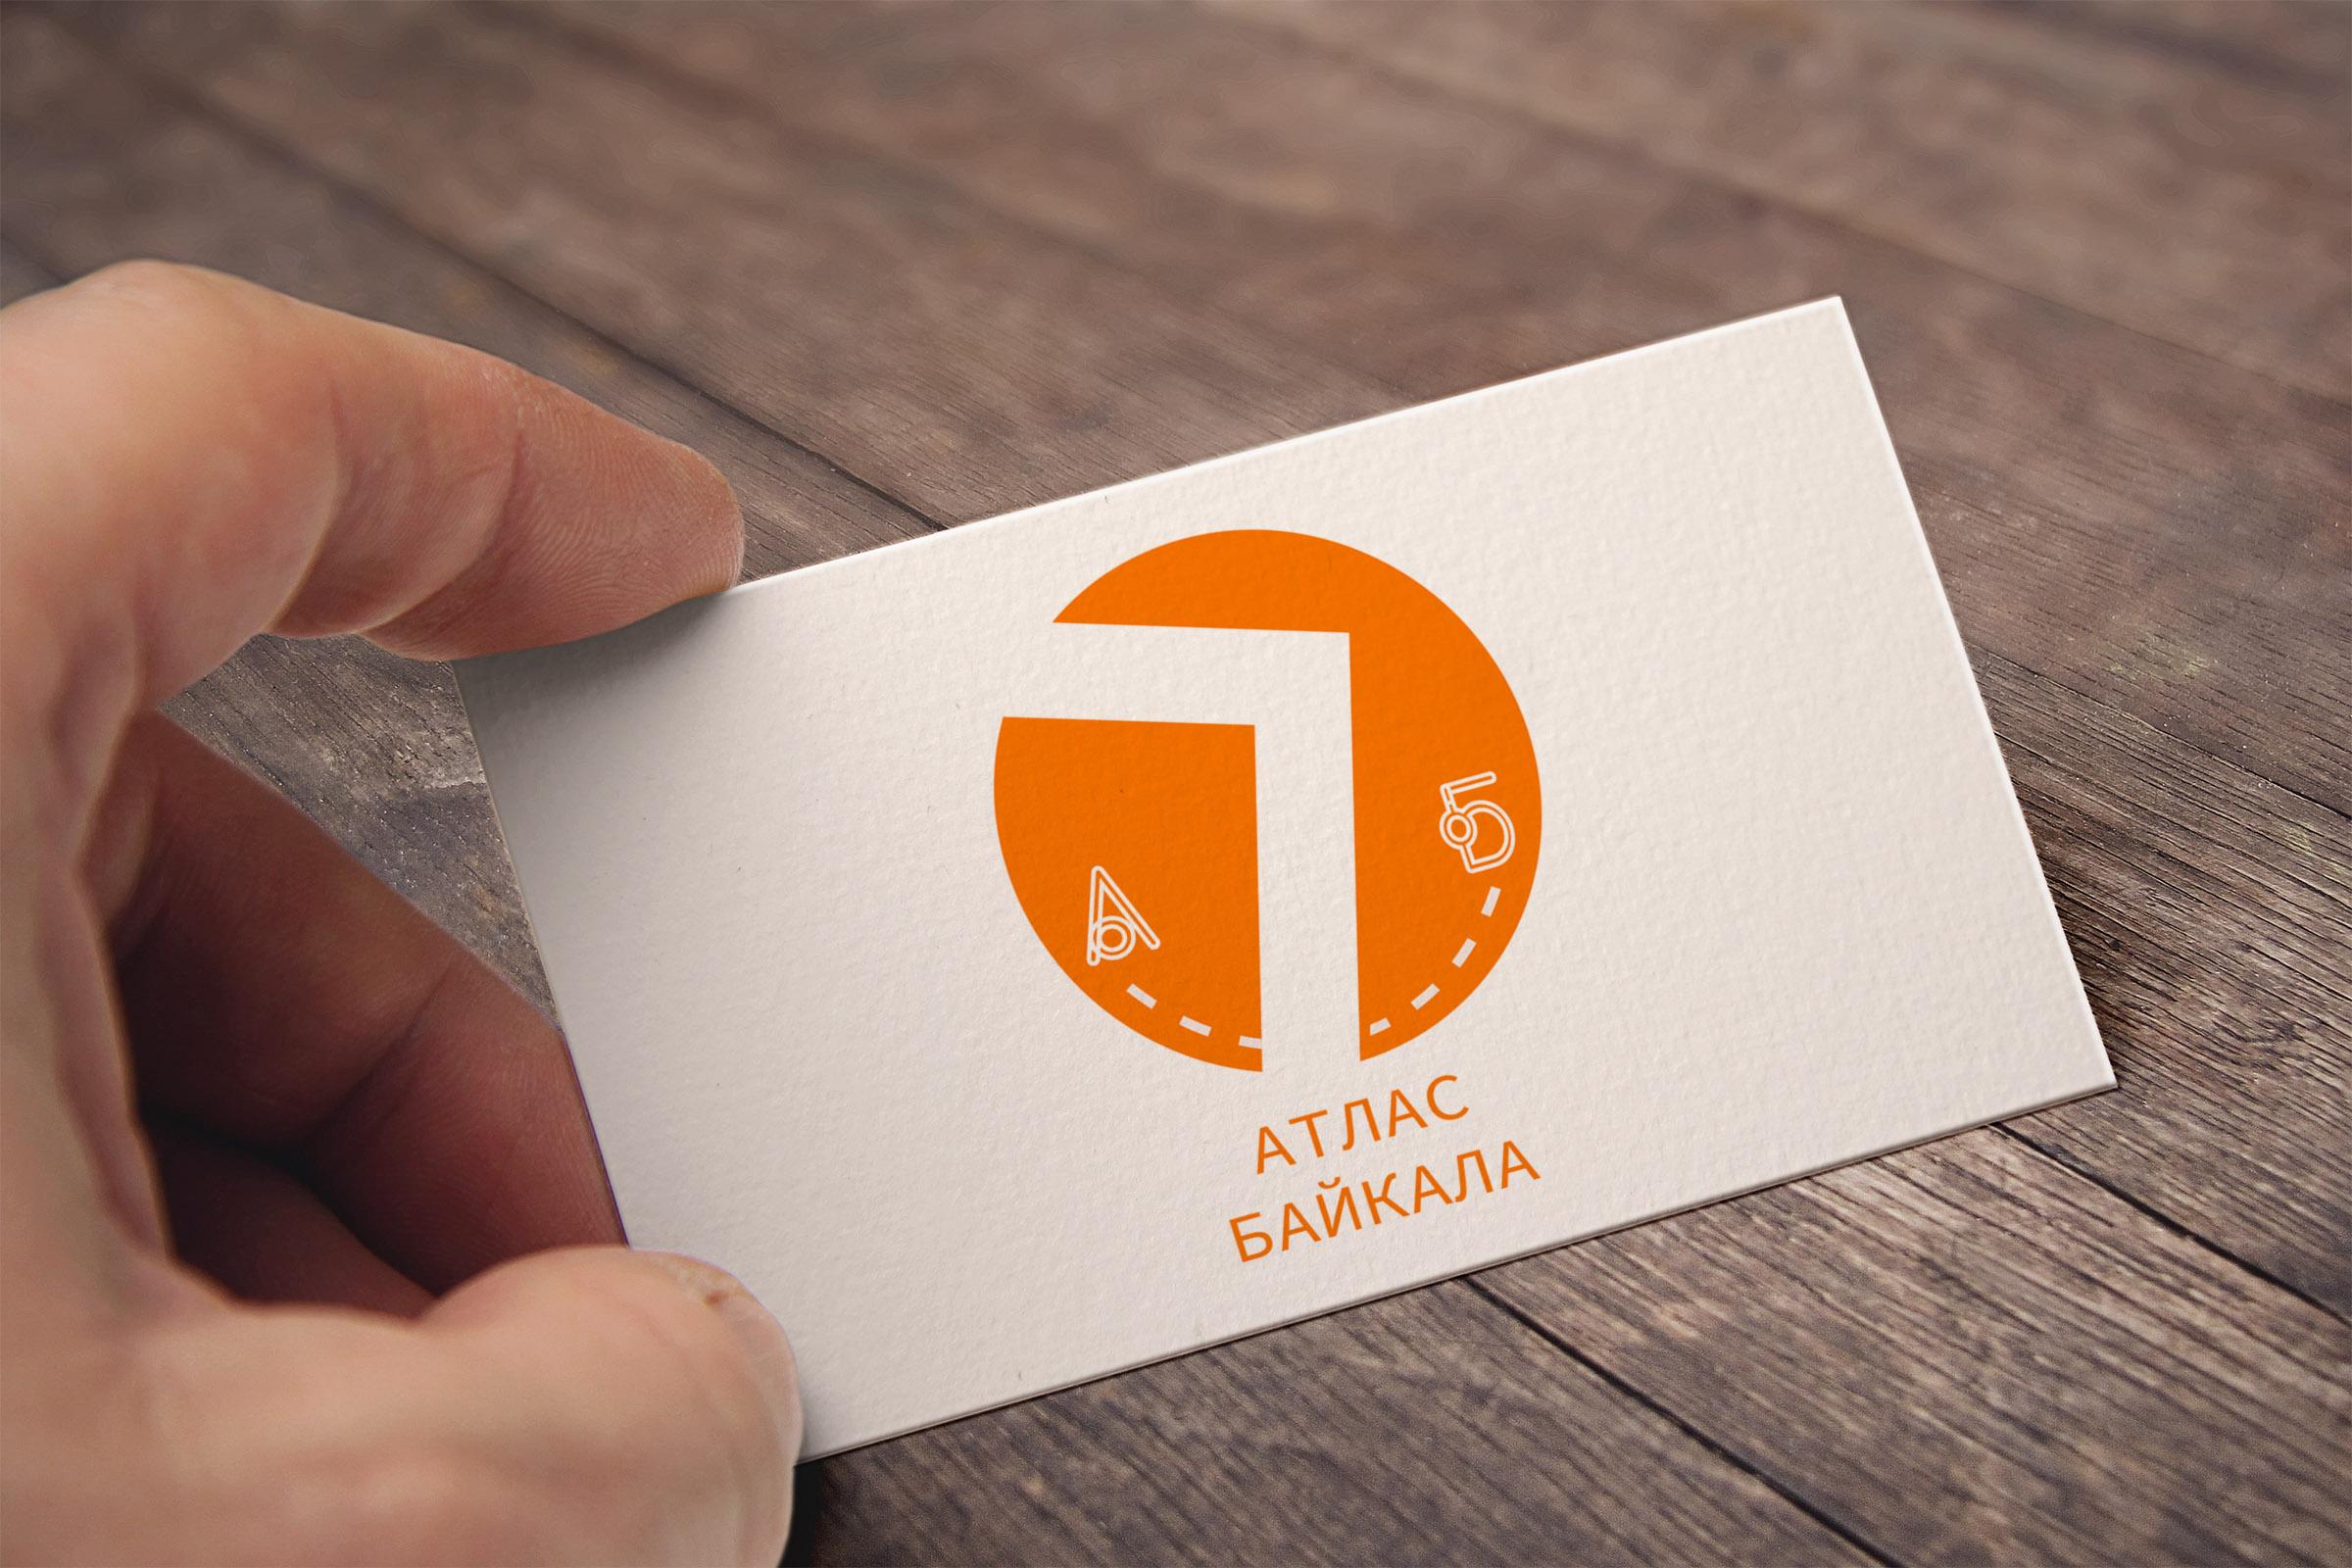 Разработка логотипа Атлас Байкала фото f_8075b1ad2c3d3d19.jpg